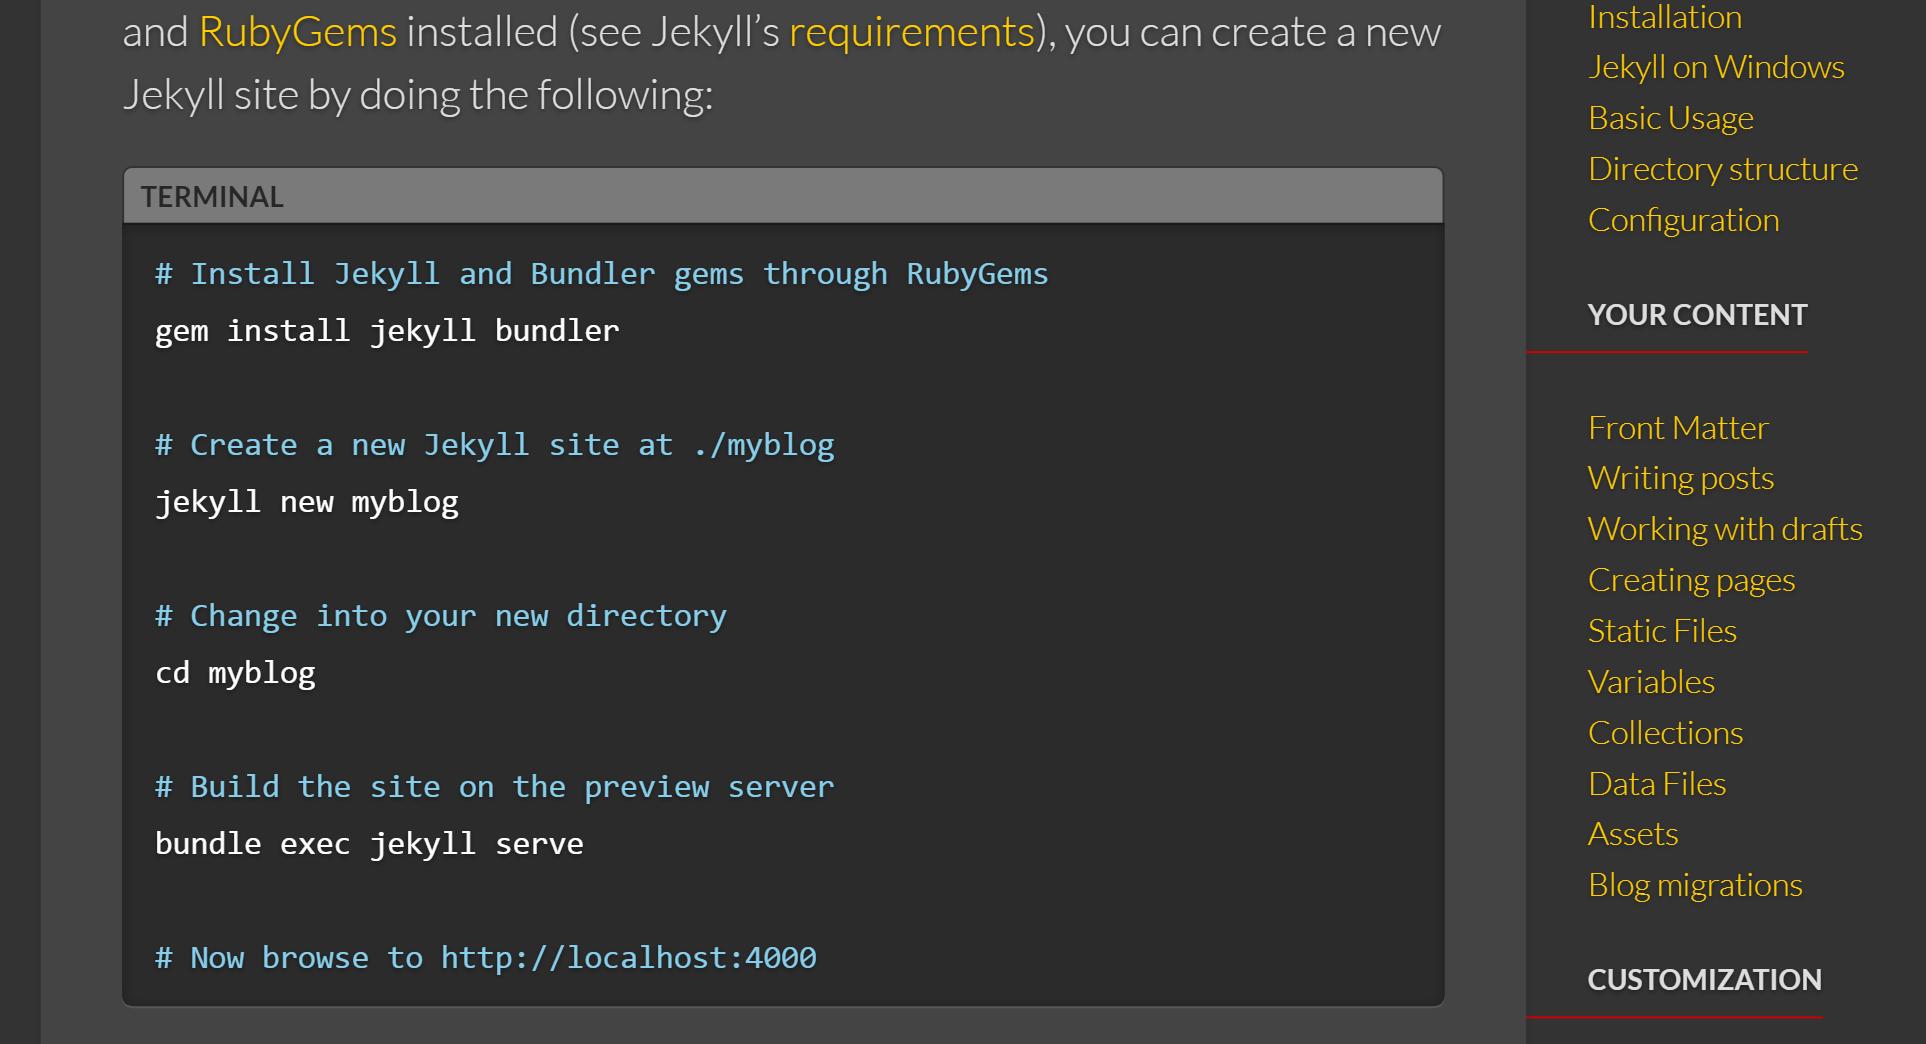 jekyllrb com_docs_quickstart